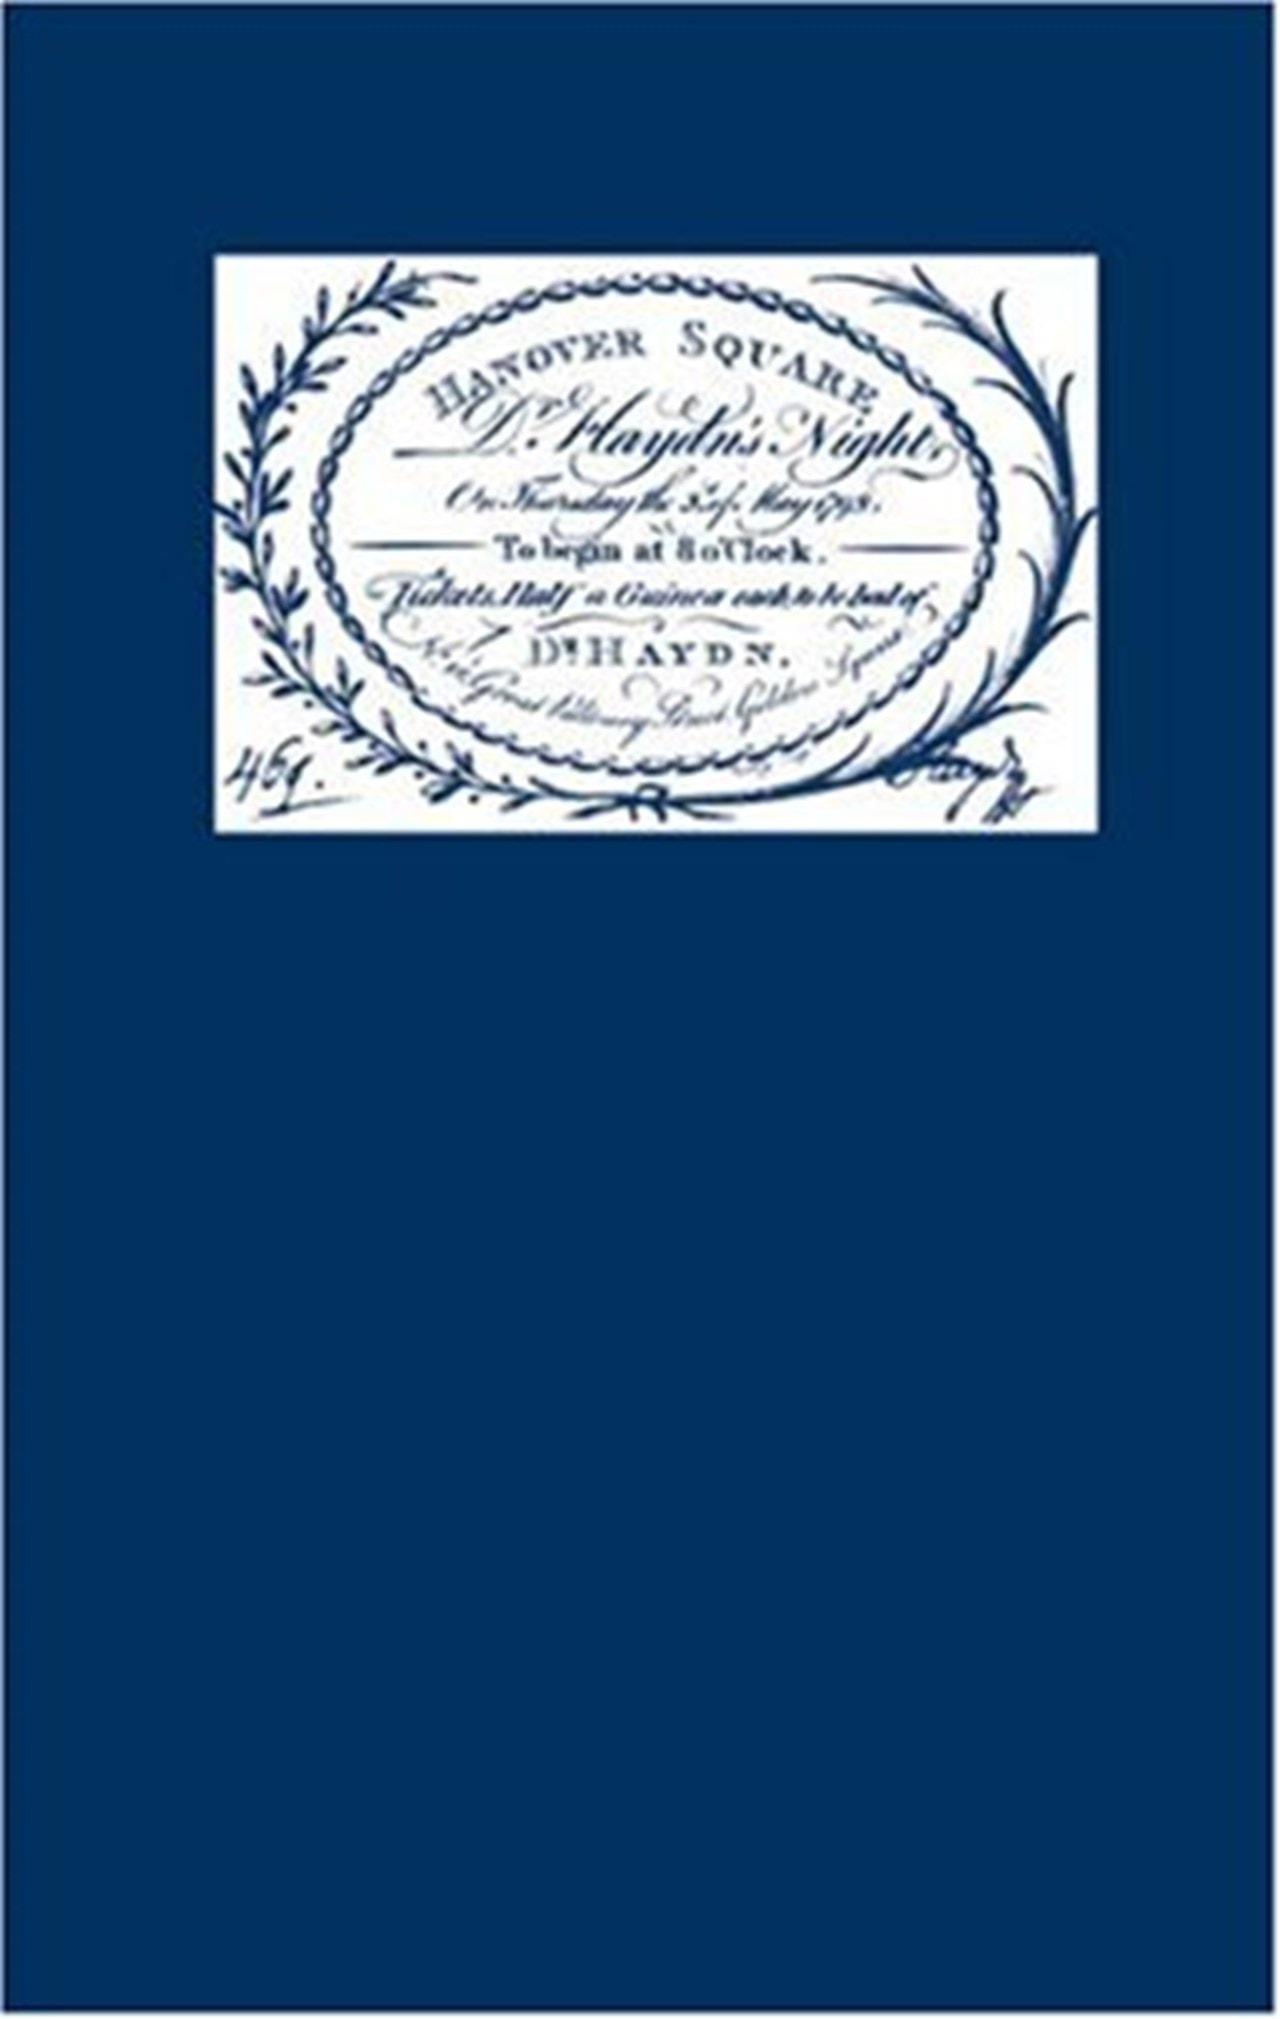 Haydn's Visits To England - 1